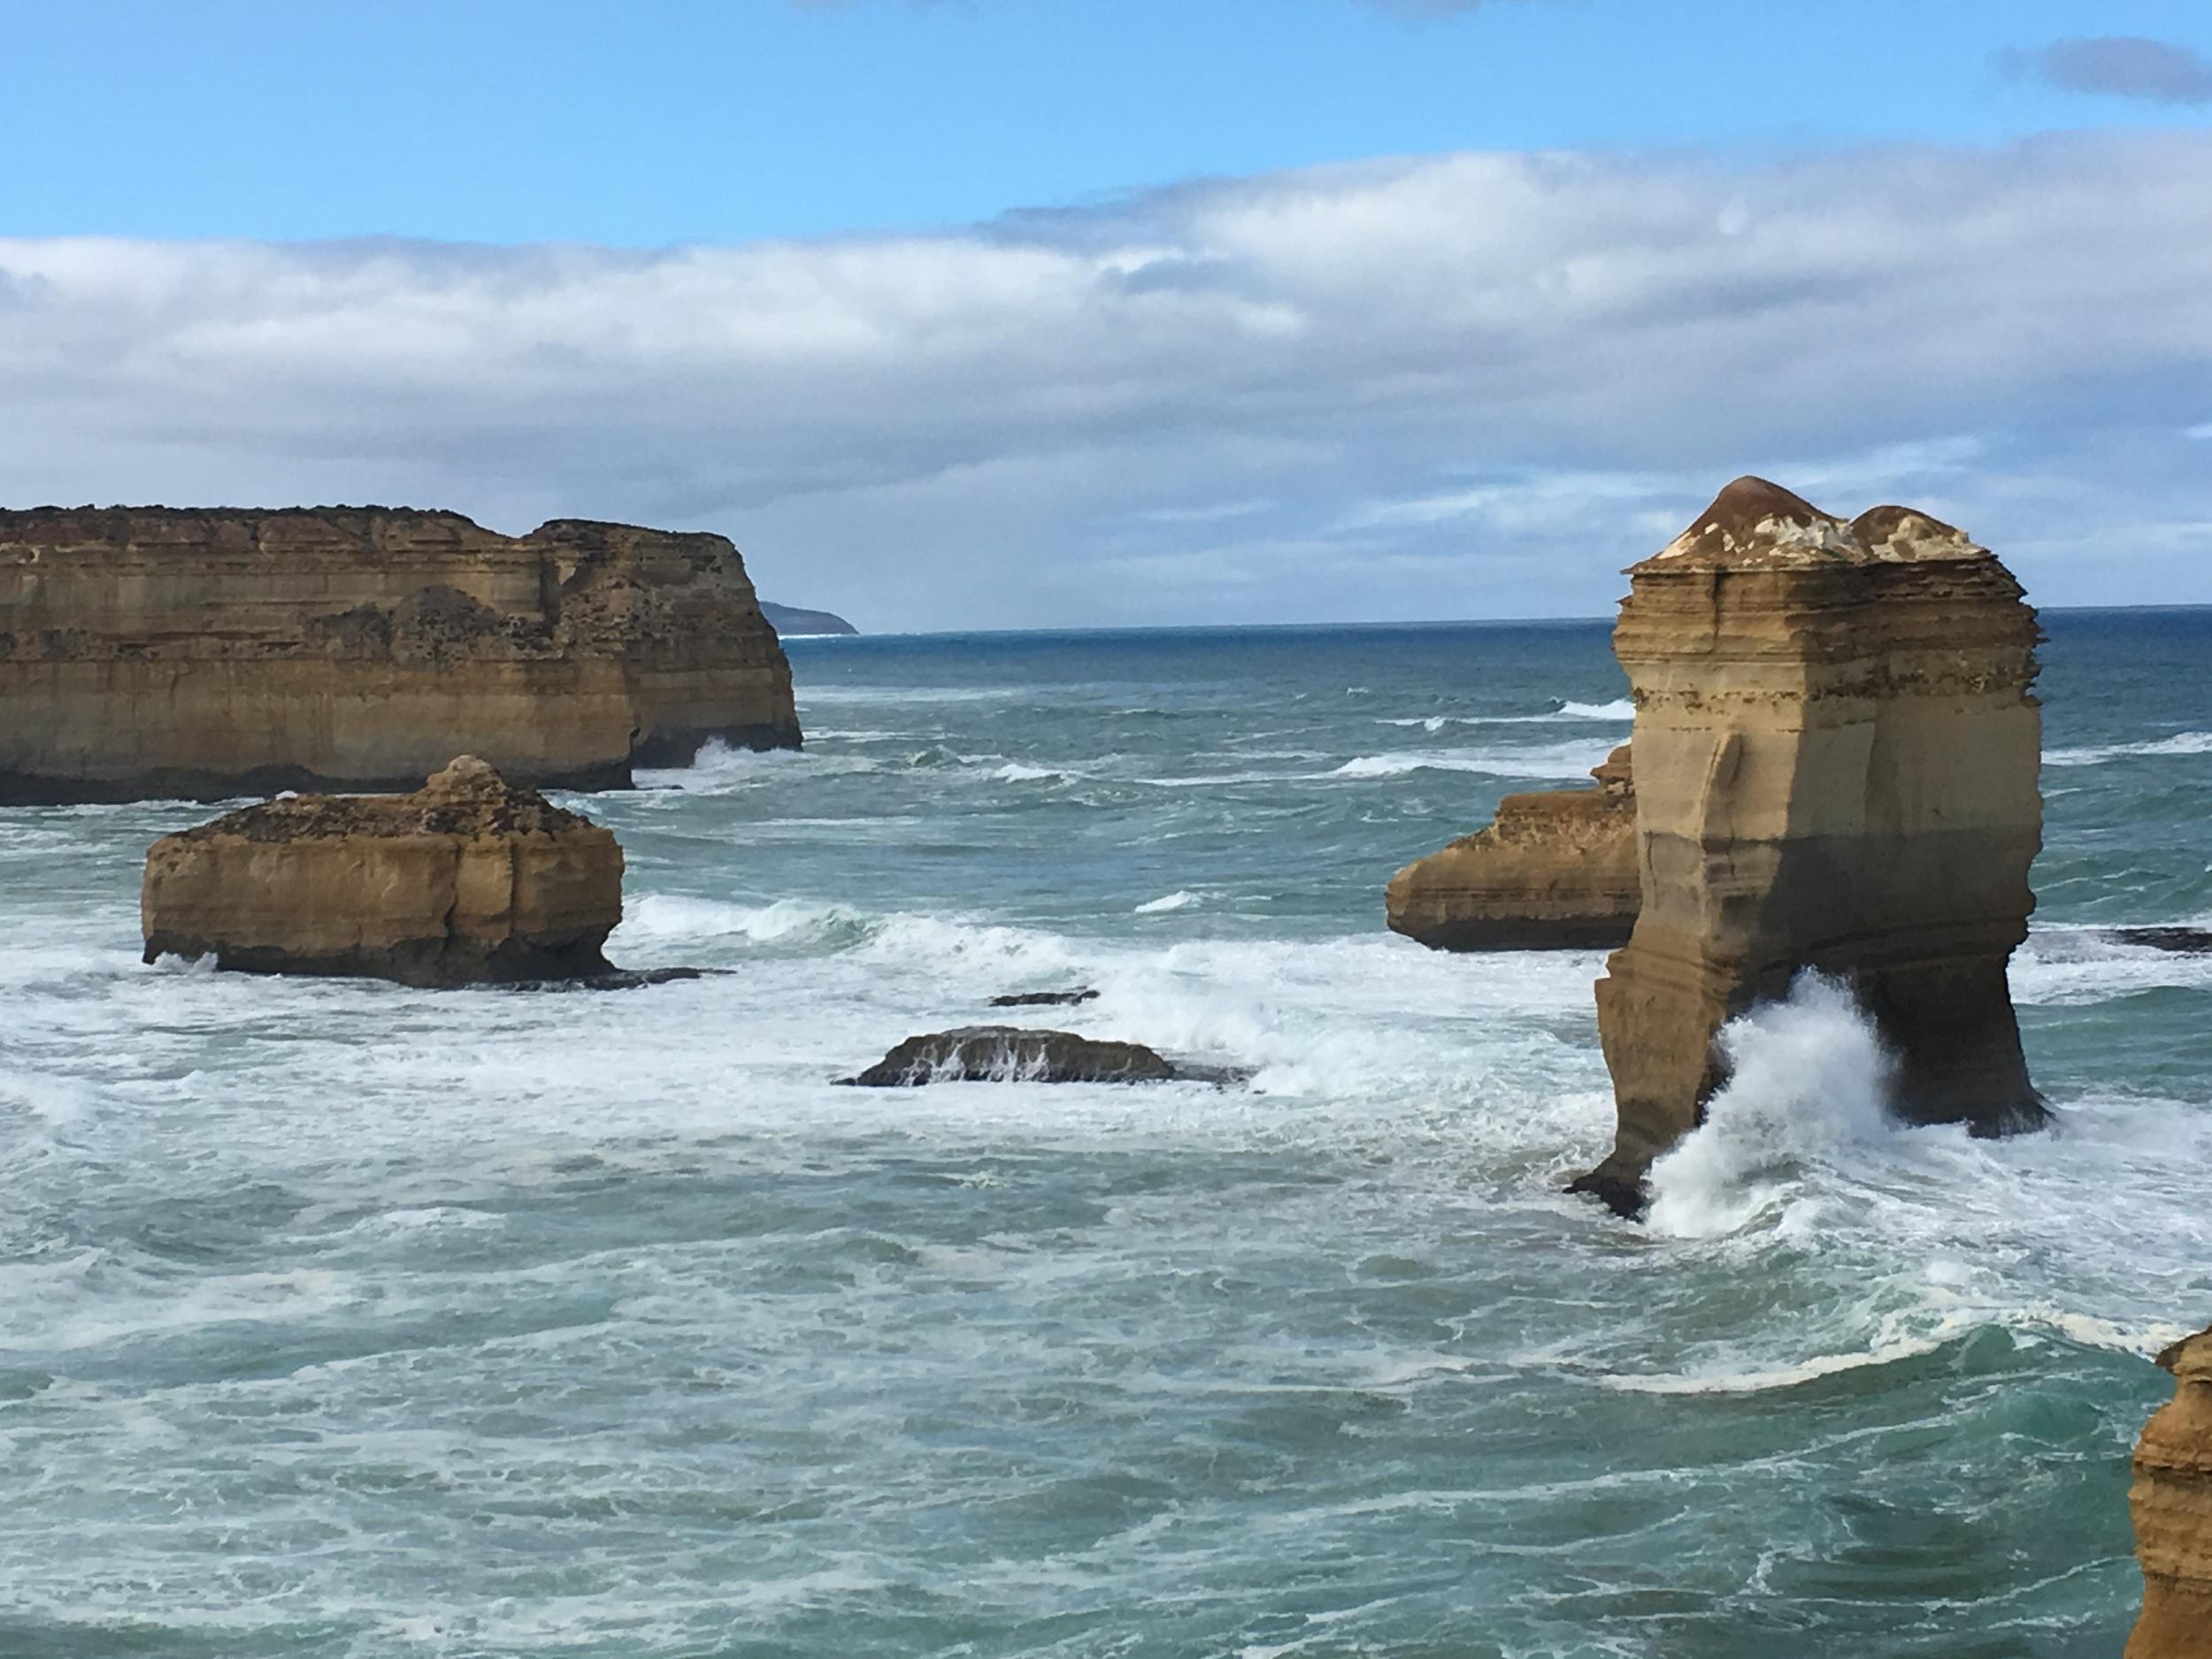 Rock vs Wave